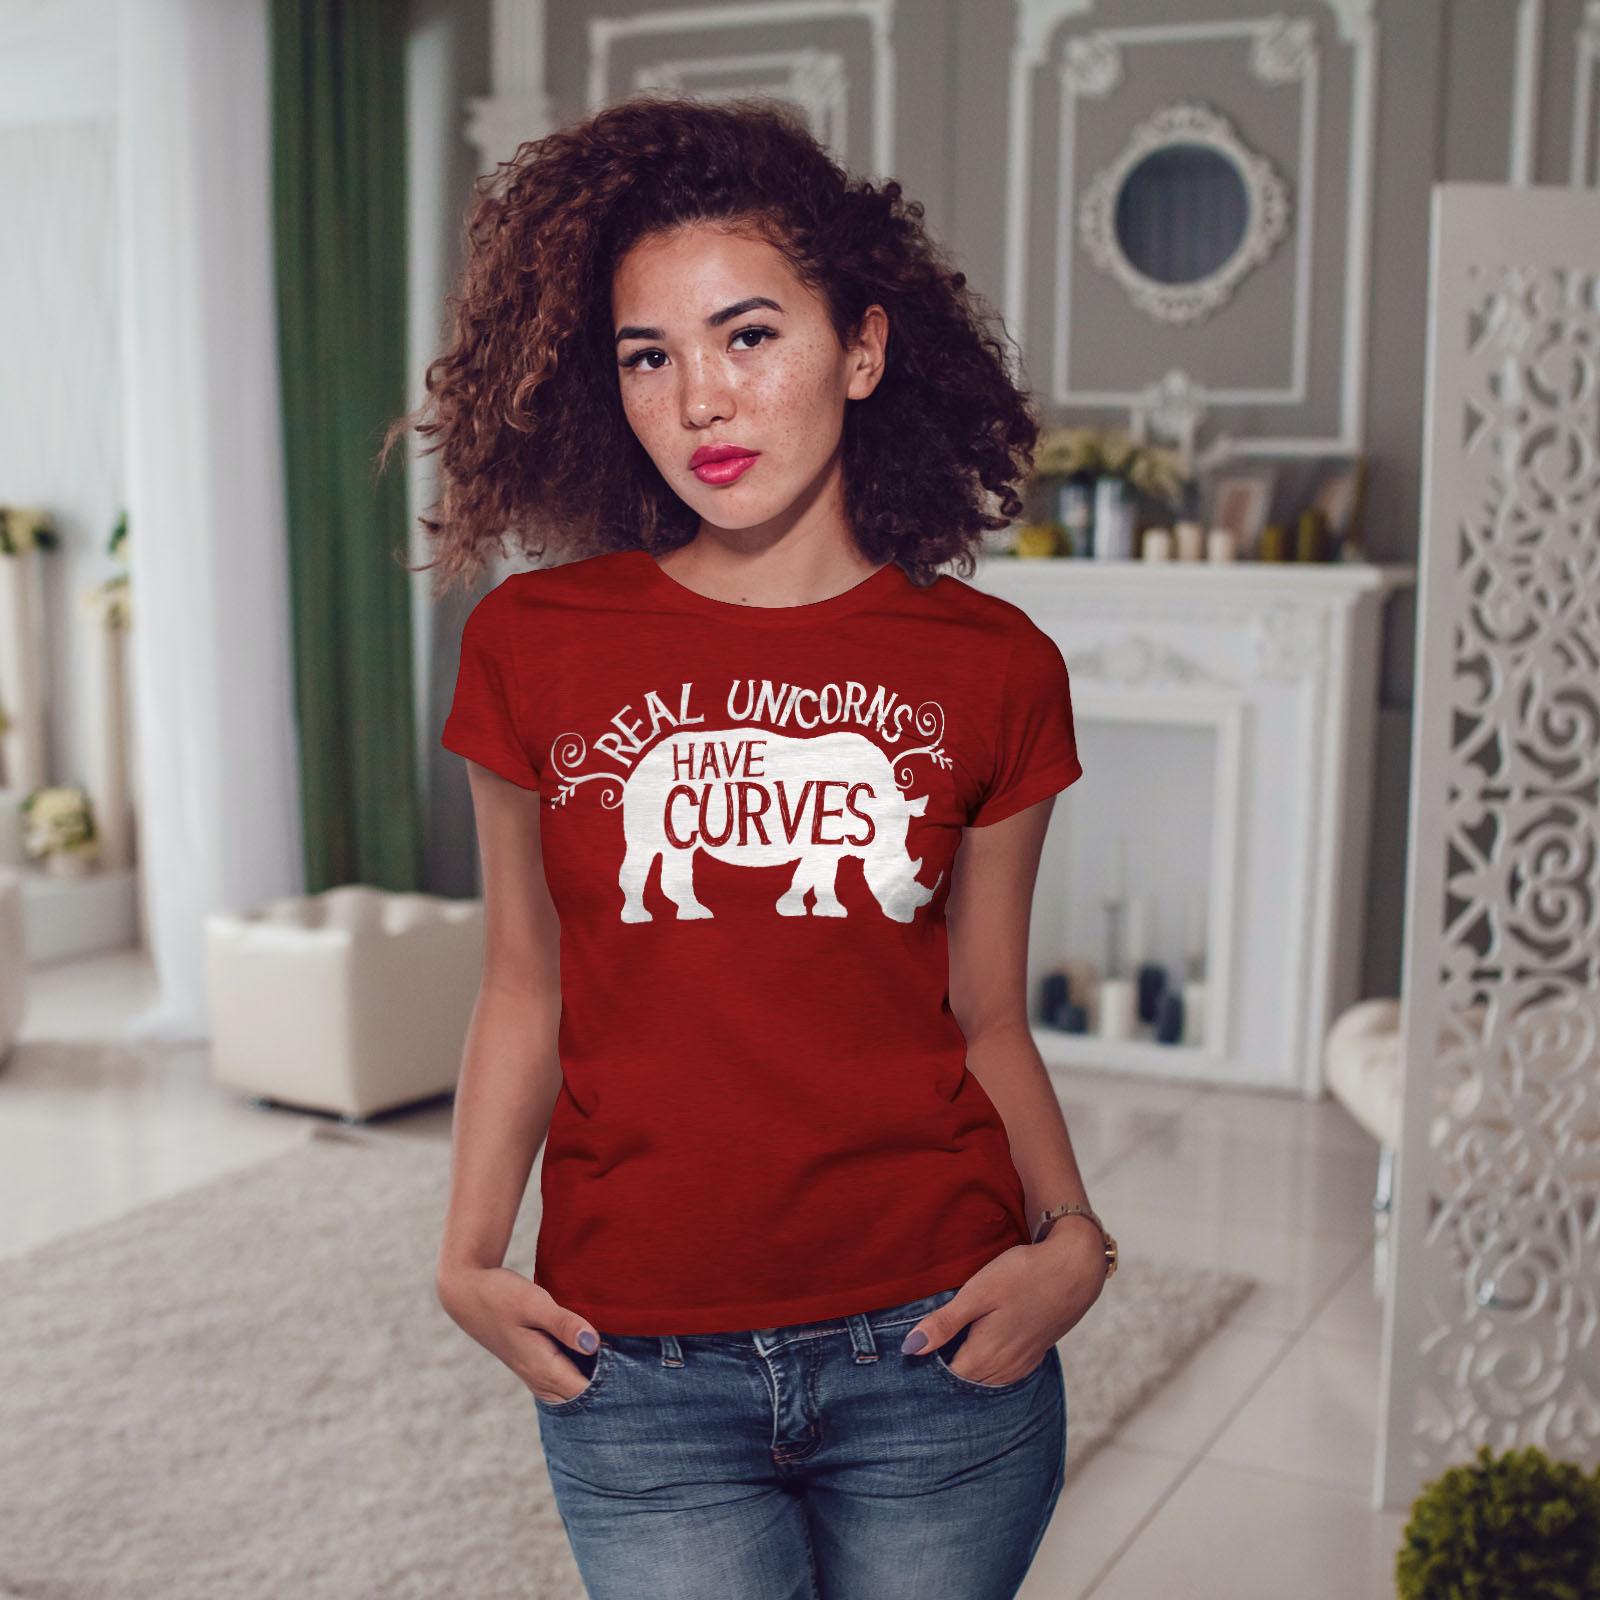 RHINO Casual Design Imprimé Tee Wellcoda licornes ont courbes T-shirt femme